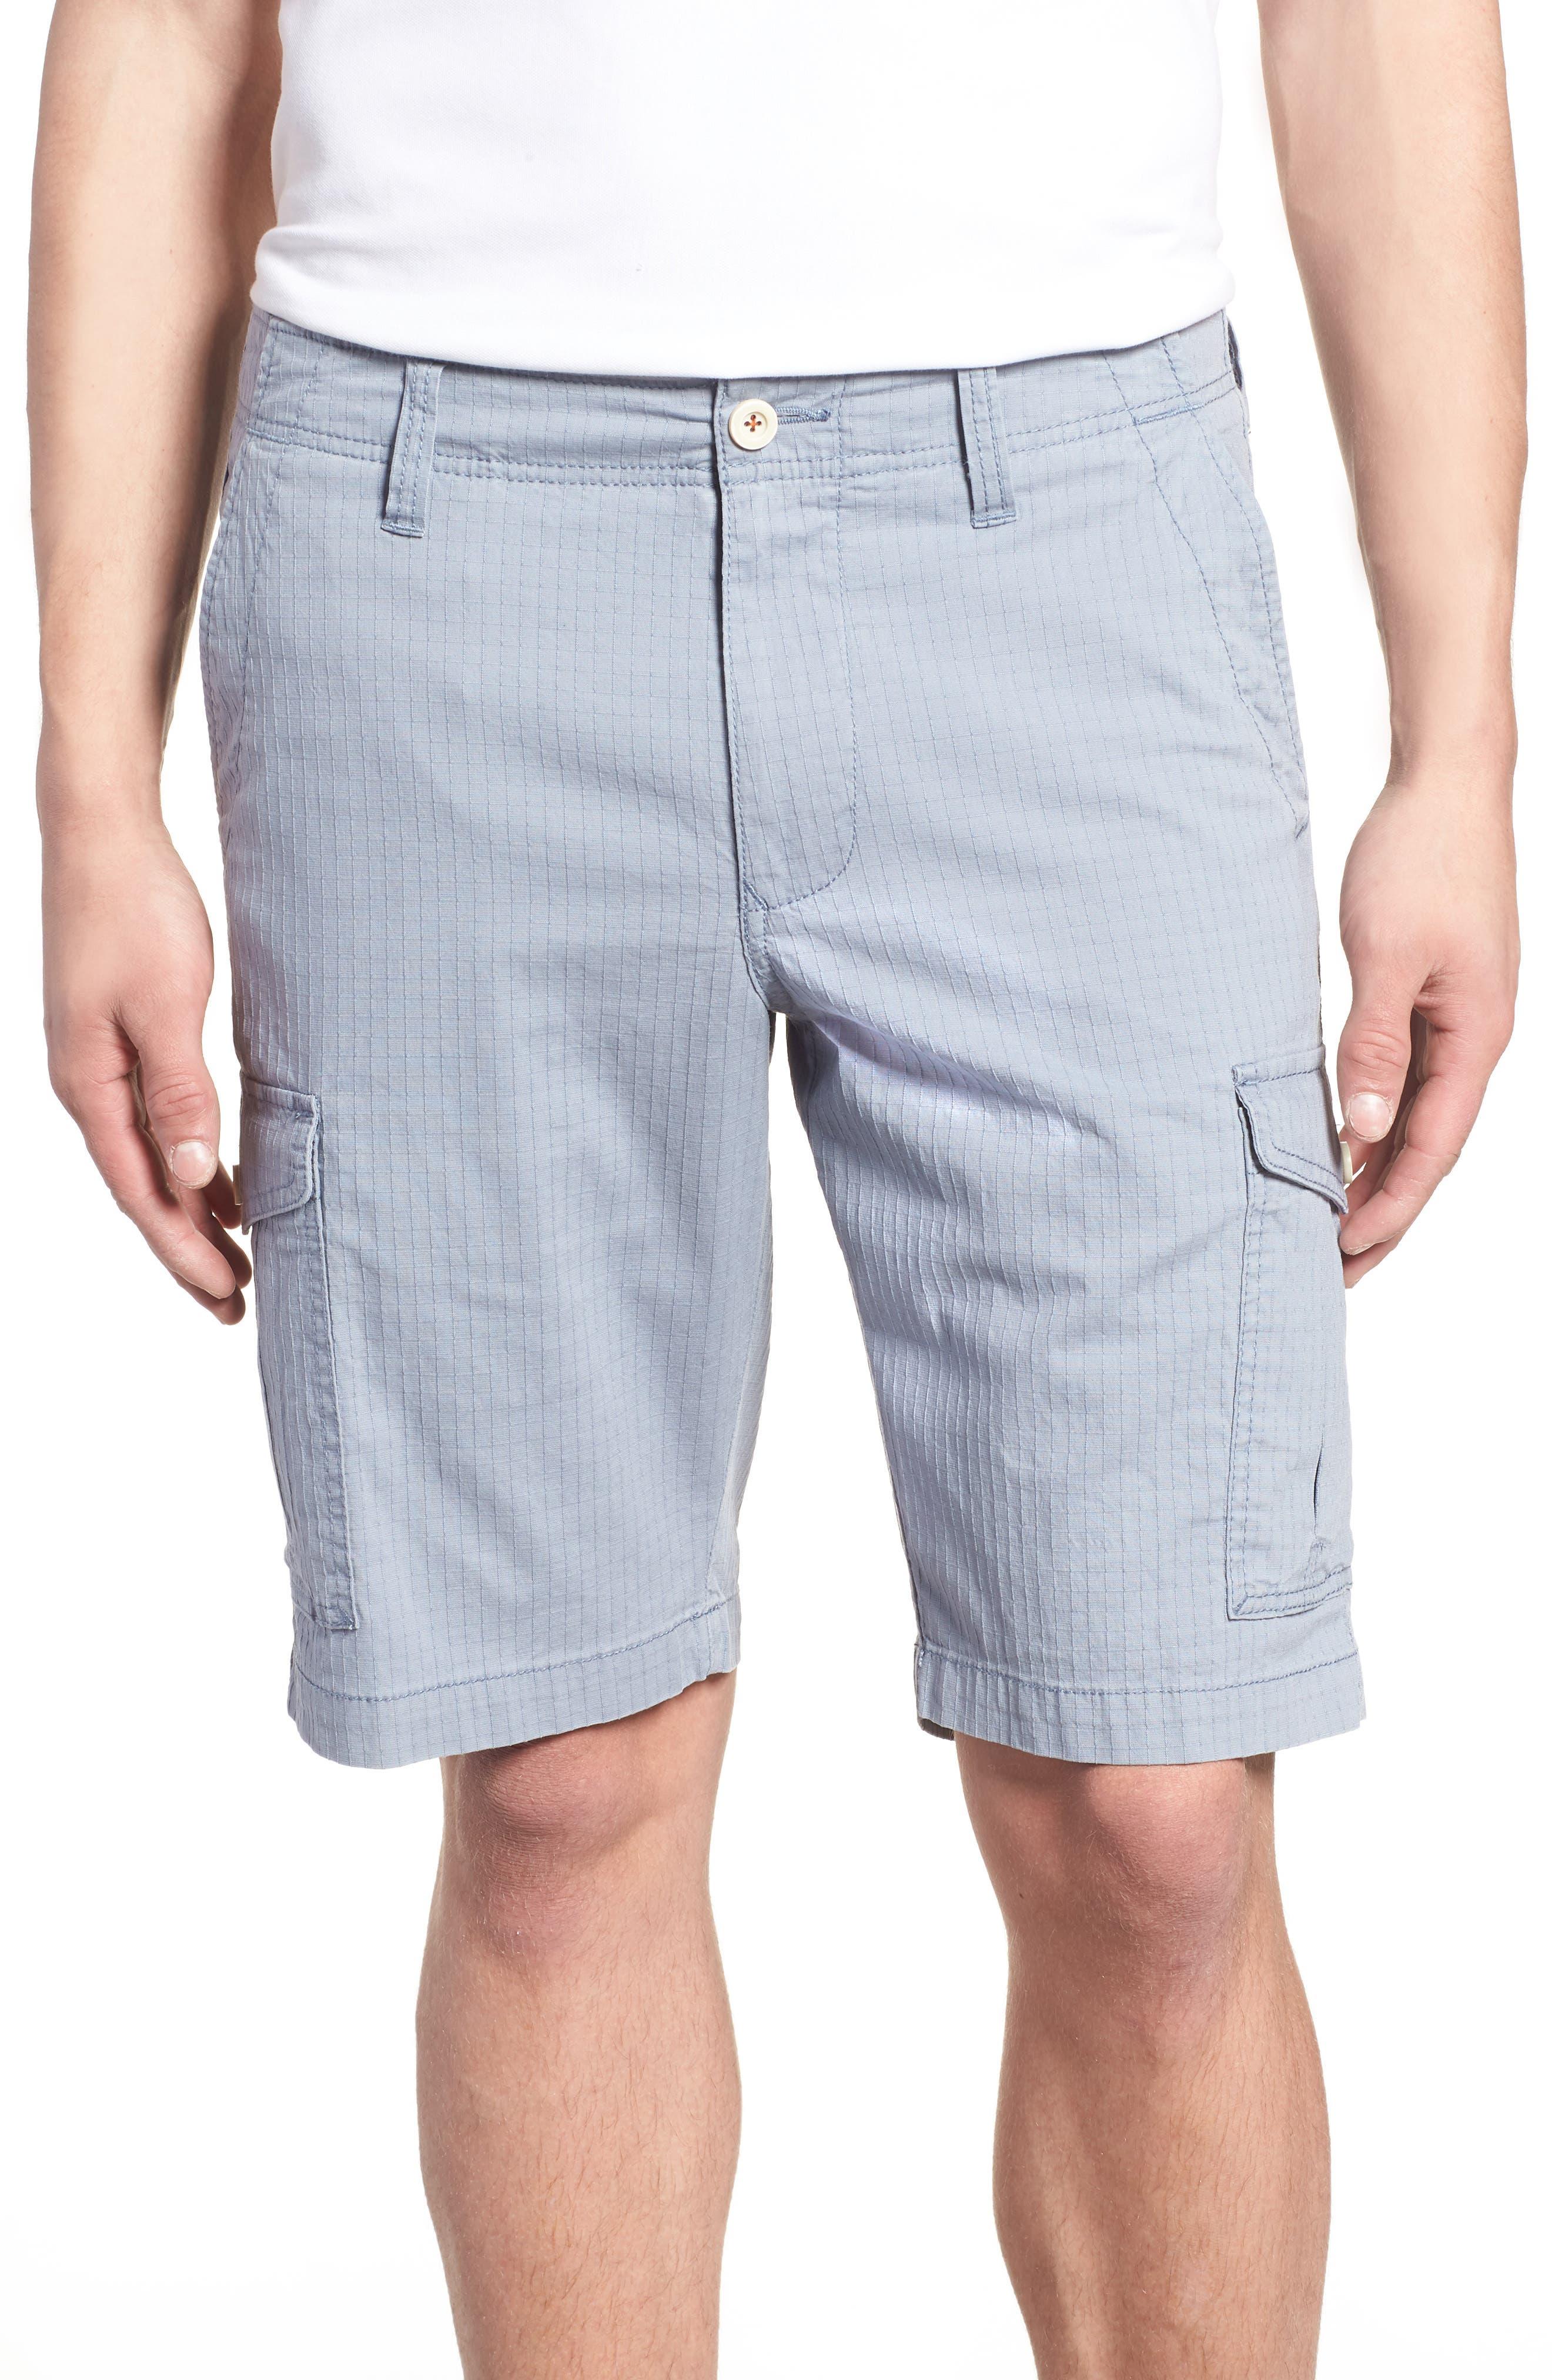 Sandbar Ripstop Cargo Shorts,                         Main,                         color, 401